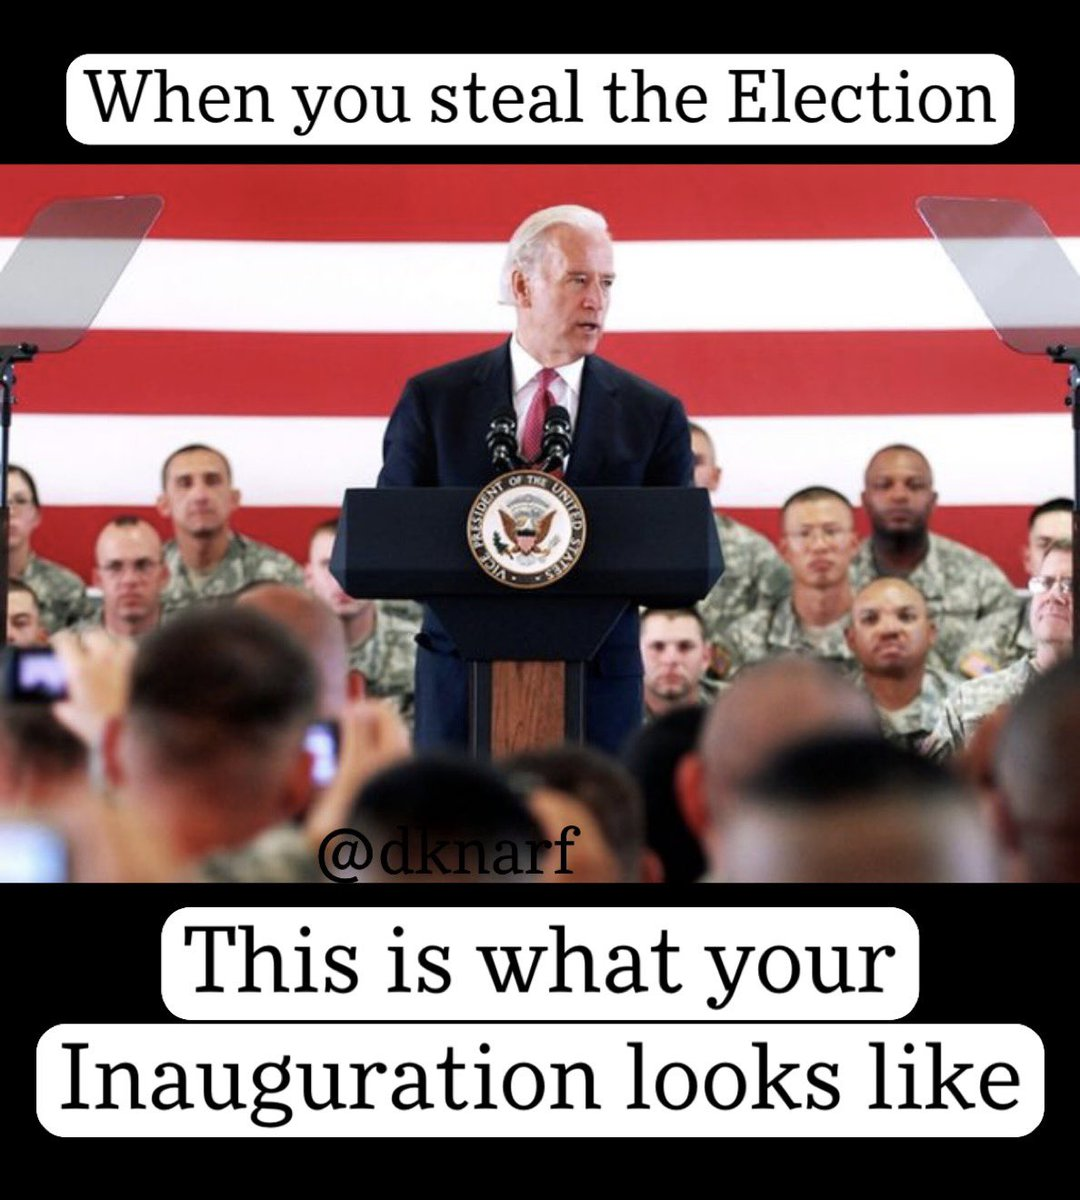 #JoeBiden  #biden #Inauguration2021  #Inauguration  #inaugurationcancelled  #NationalGuard